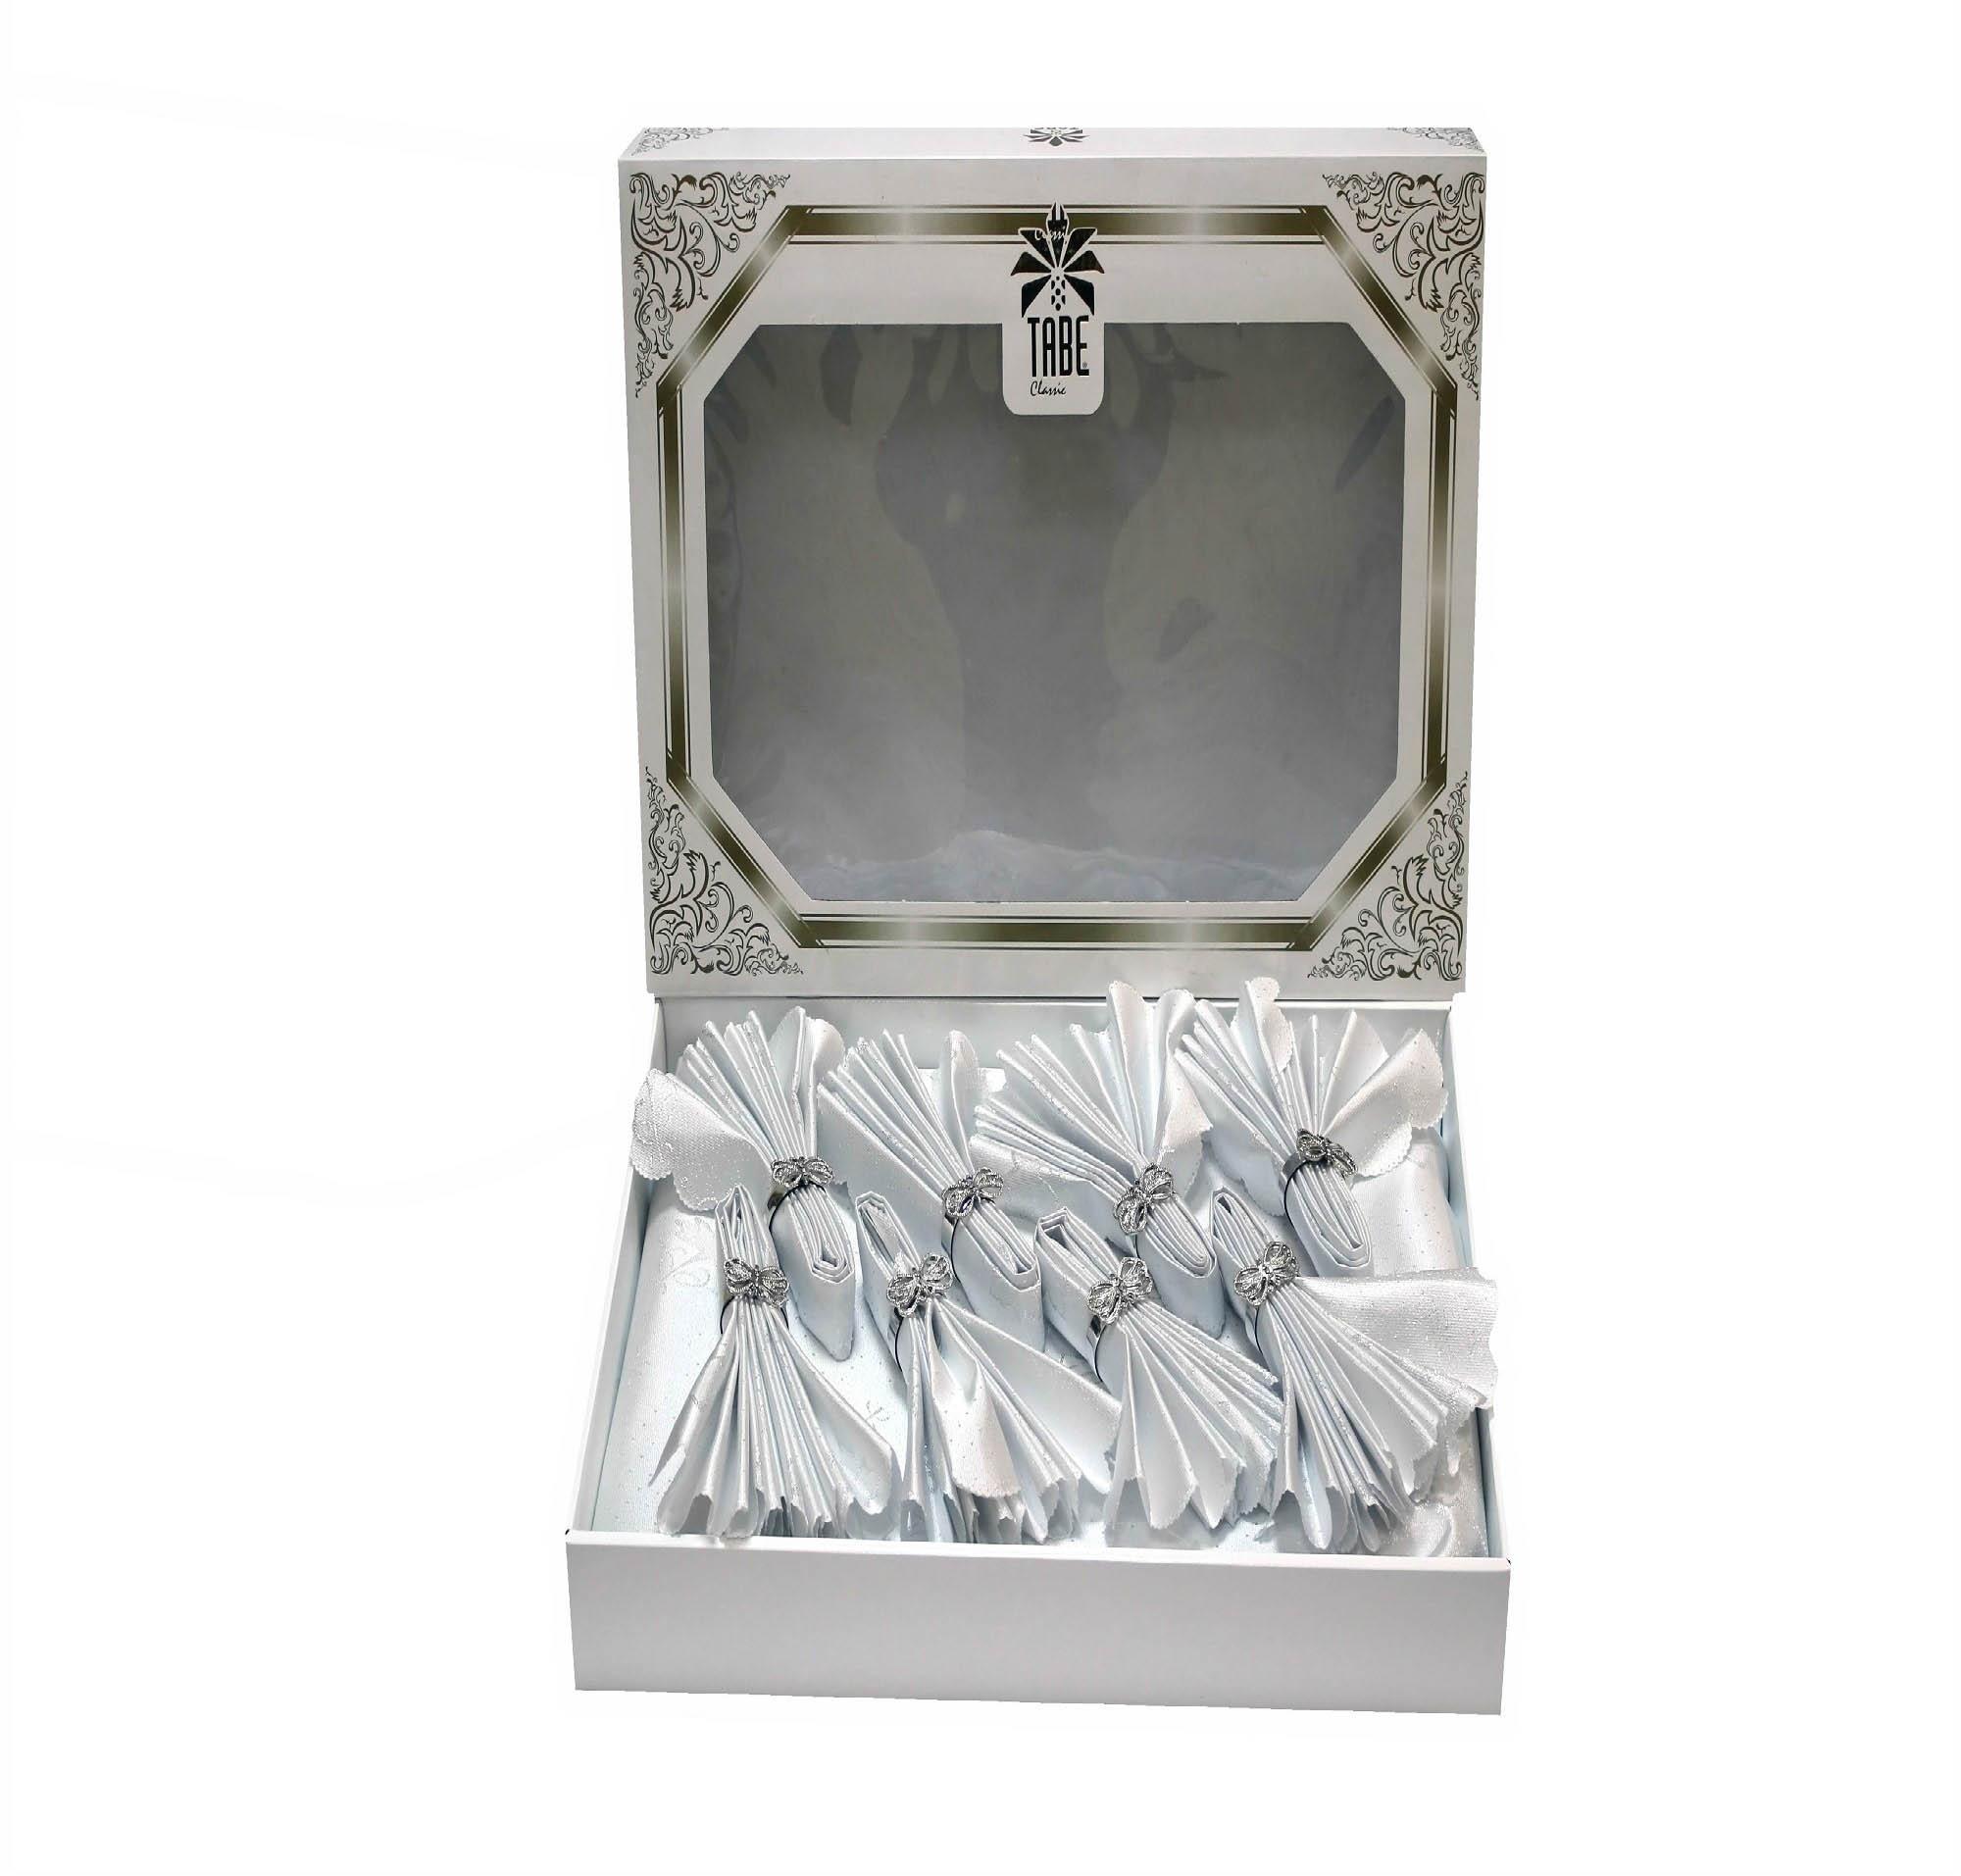 Скатерти и салфетки TABE Скатерть Set Цвет: Серебро (160х220 см) скатерти и салфетки подушкино скатерть henna 140х180 см